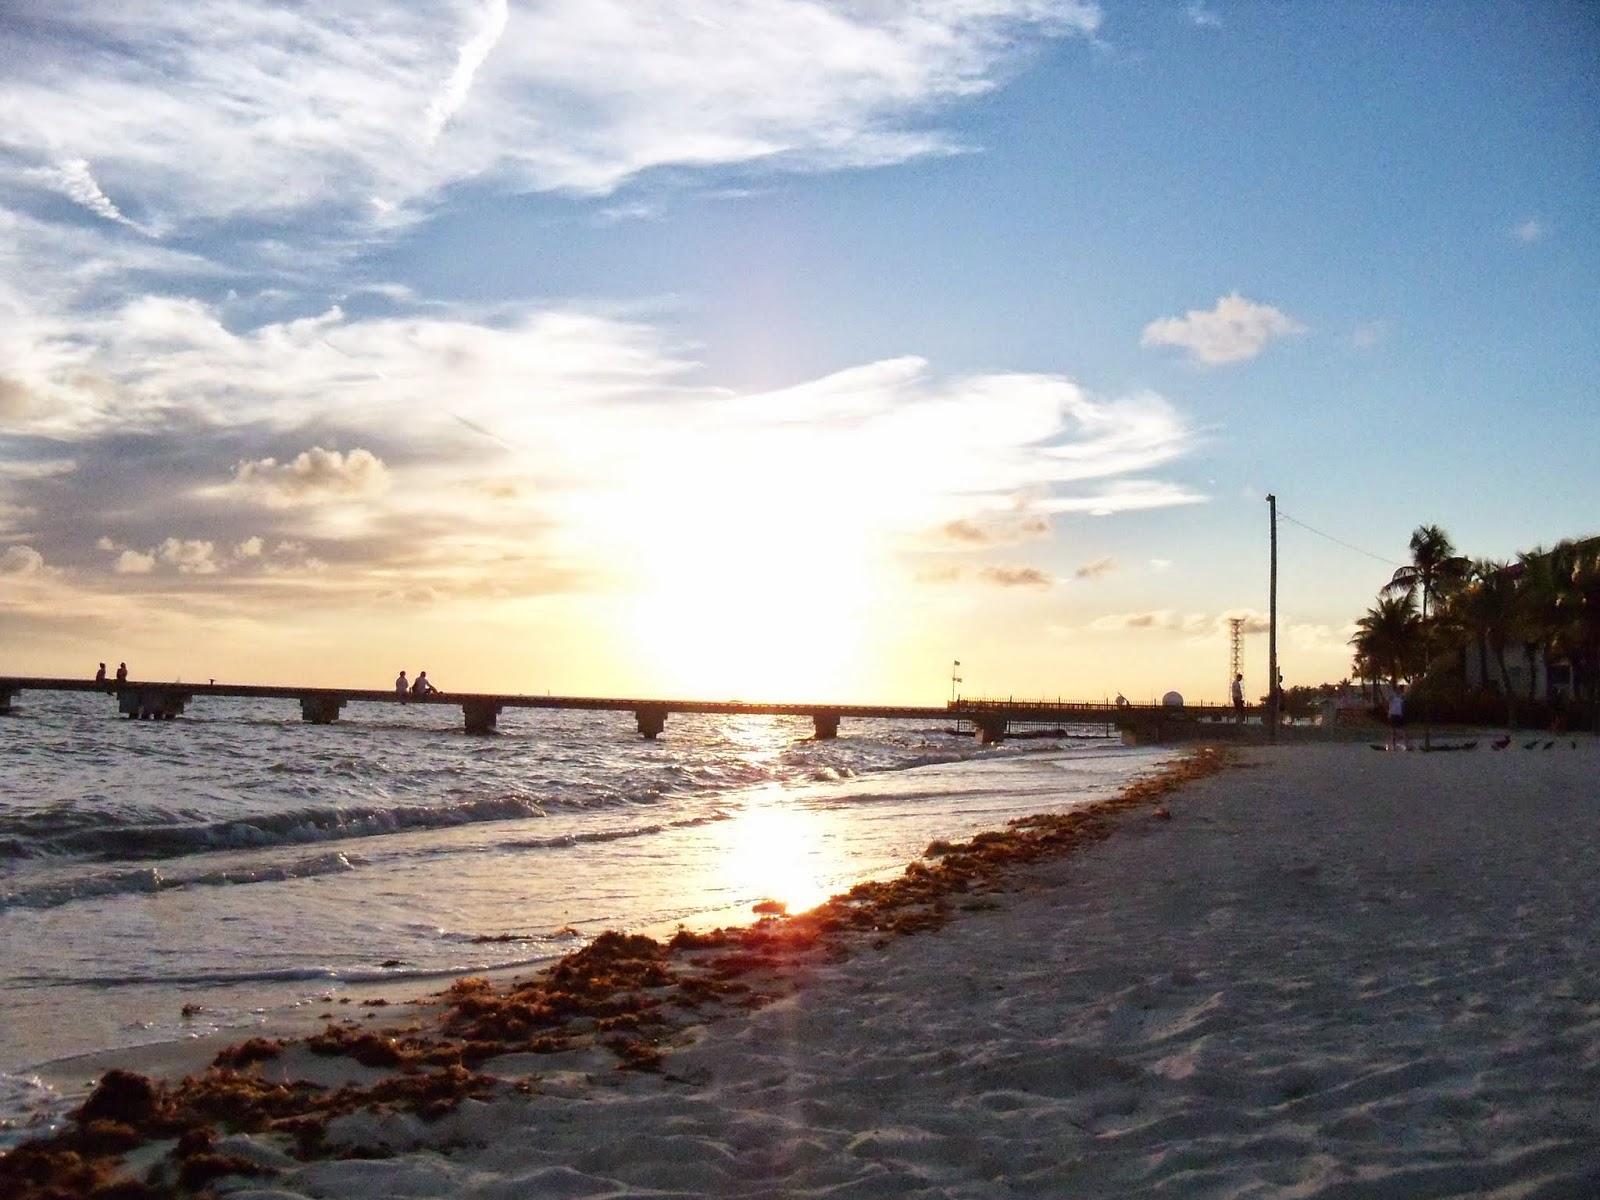 Key West Vacation - 116_5546.JPG